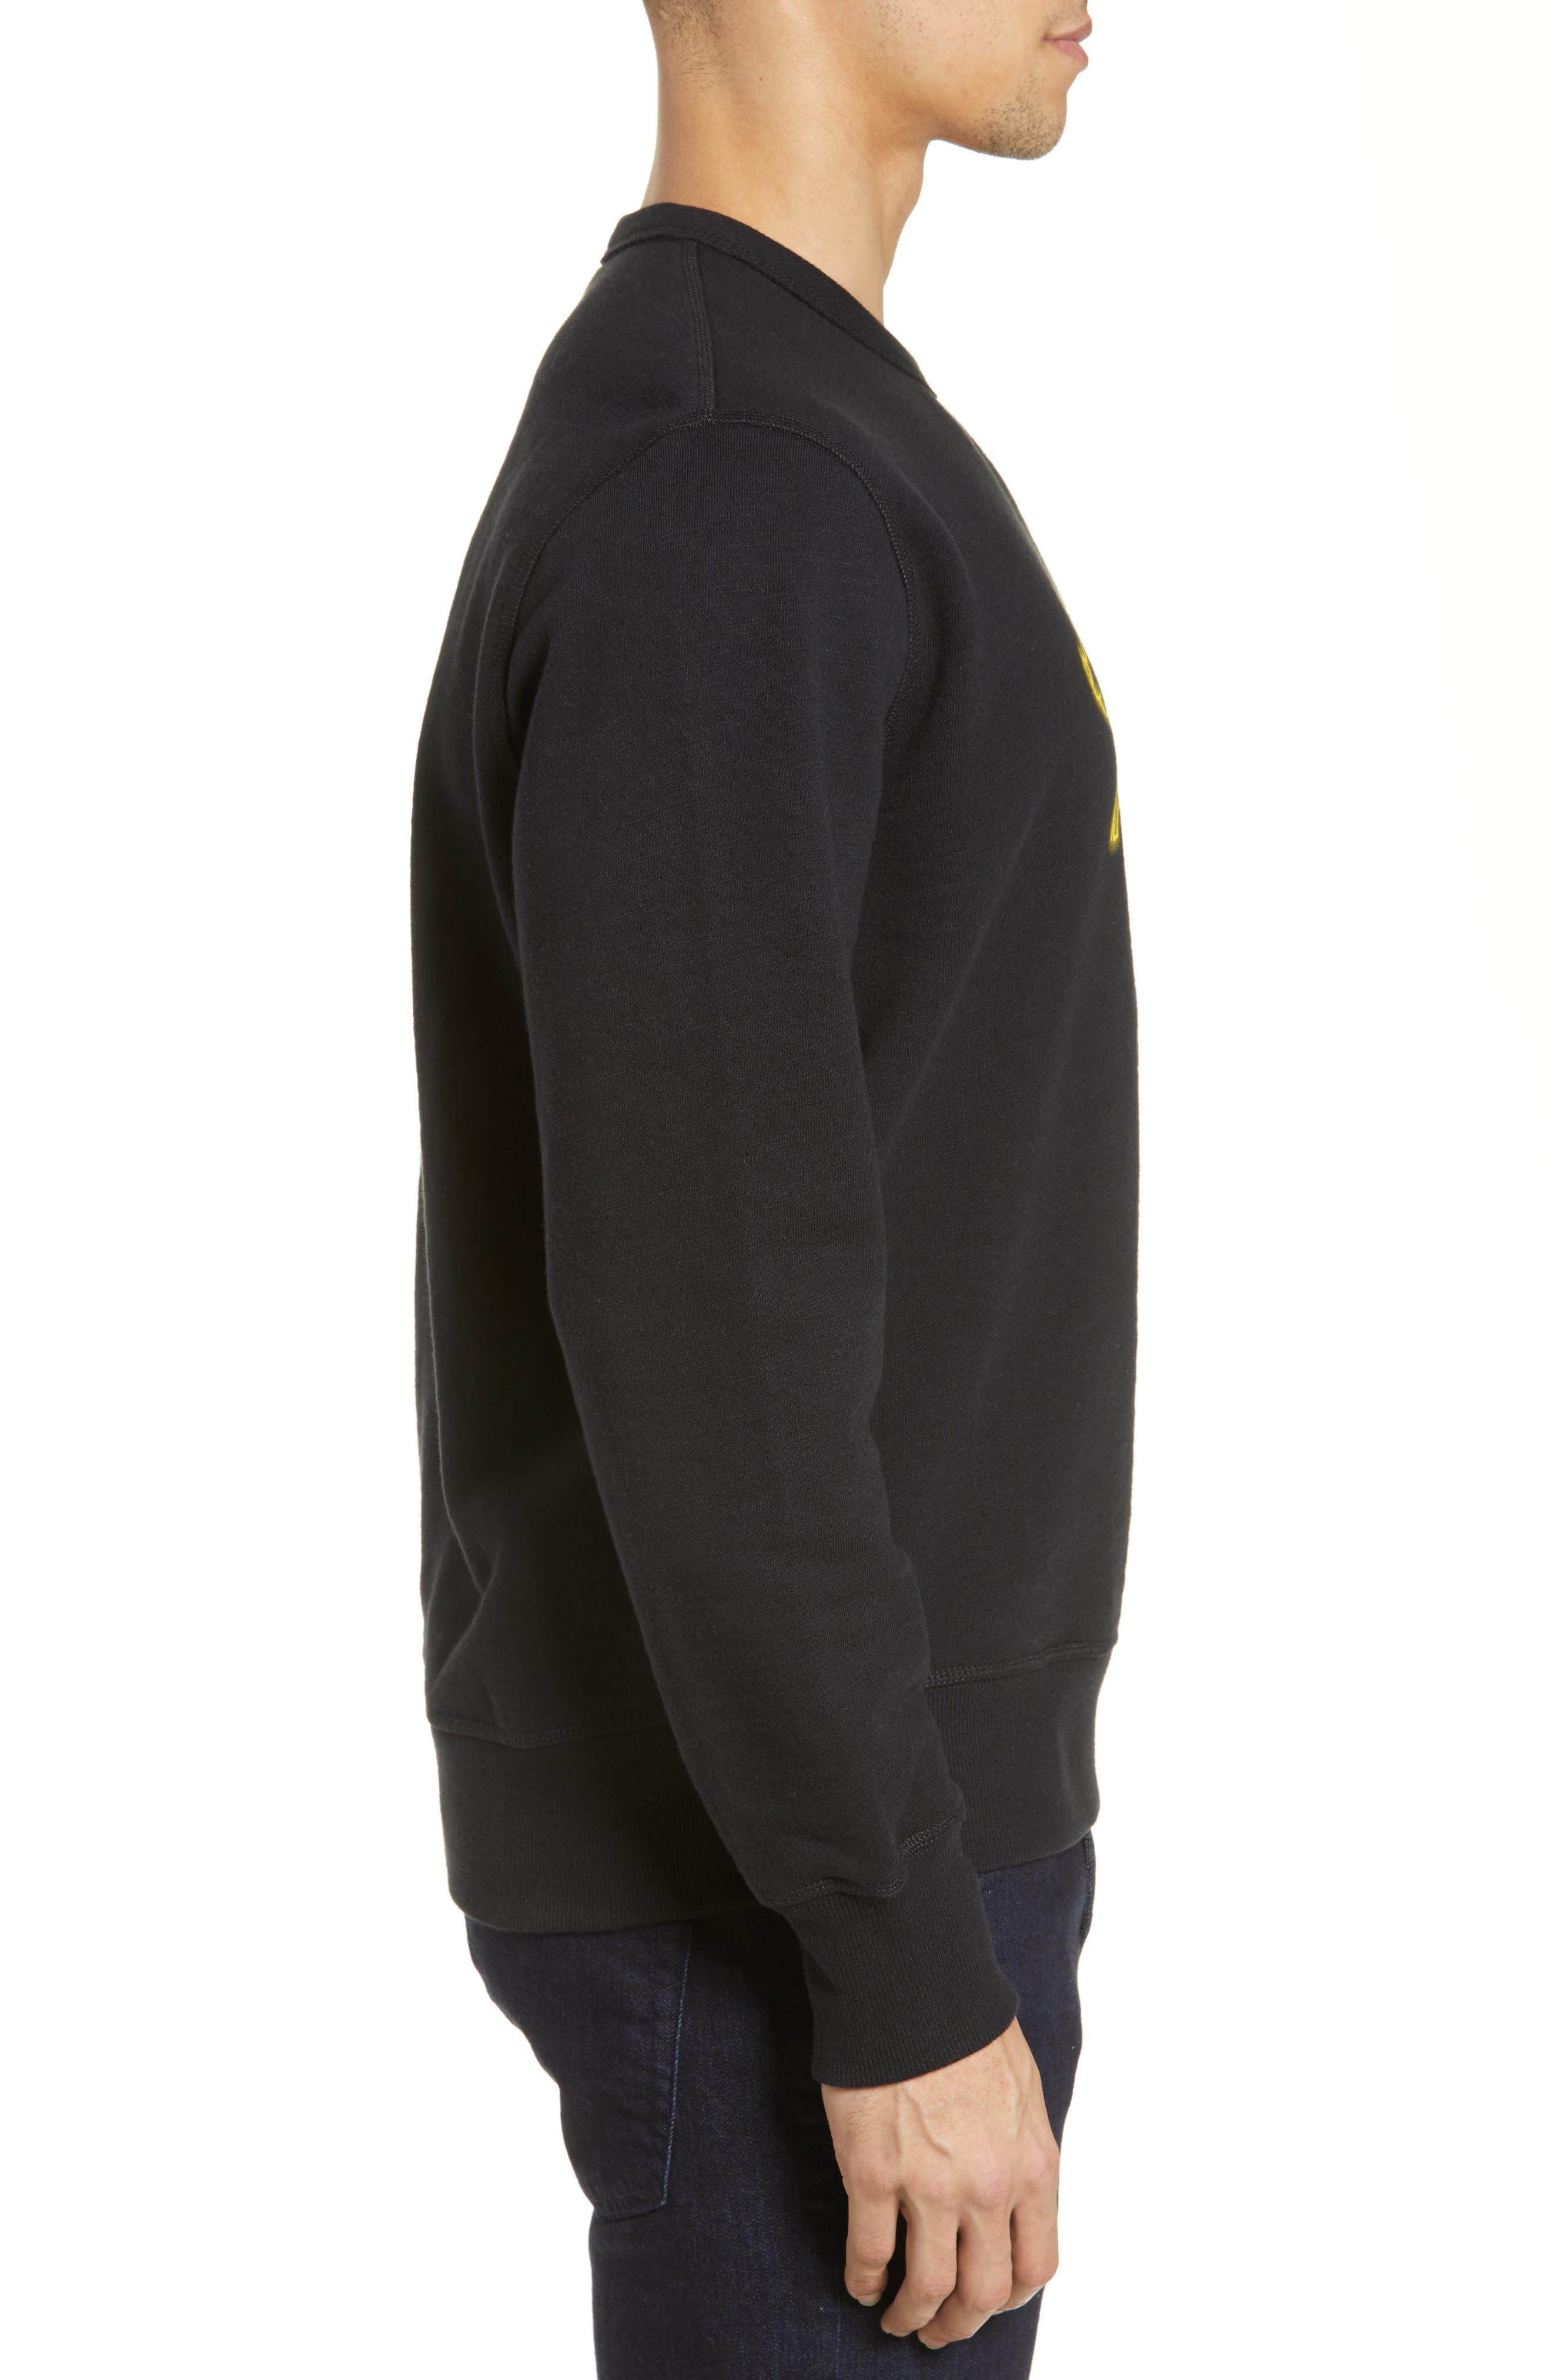 RAG & BONE, Year of the Pig Graphic Sweatshirt, Alternate thumbnail 3, color, BLACK